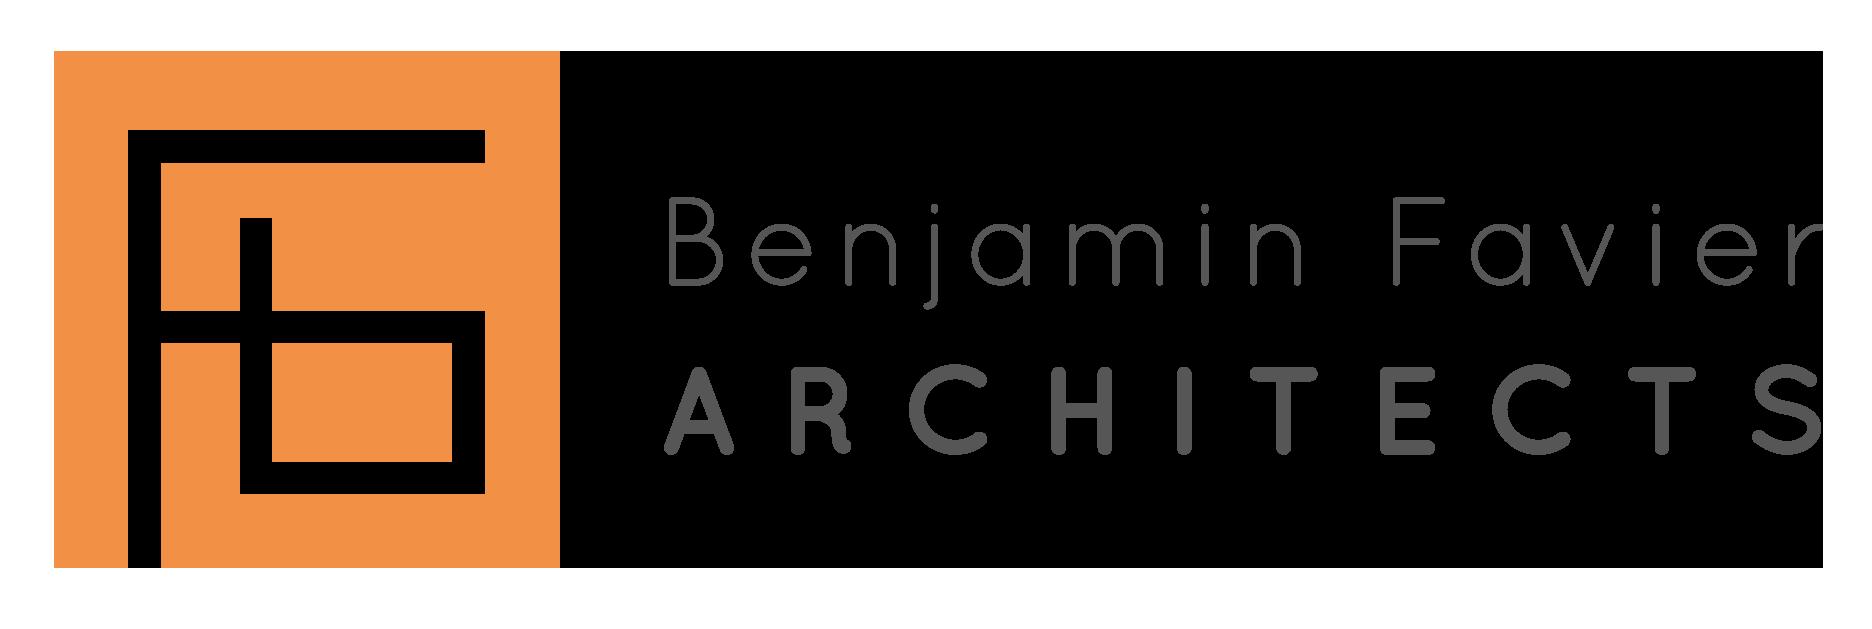 Benjamin Favier Architects